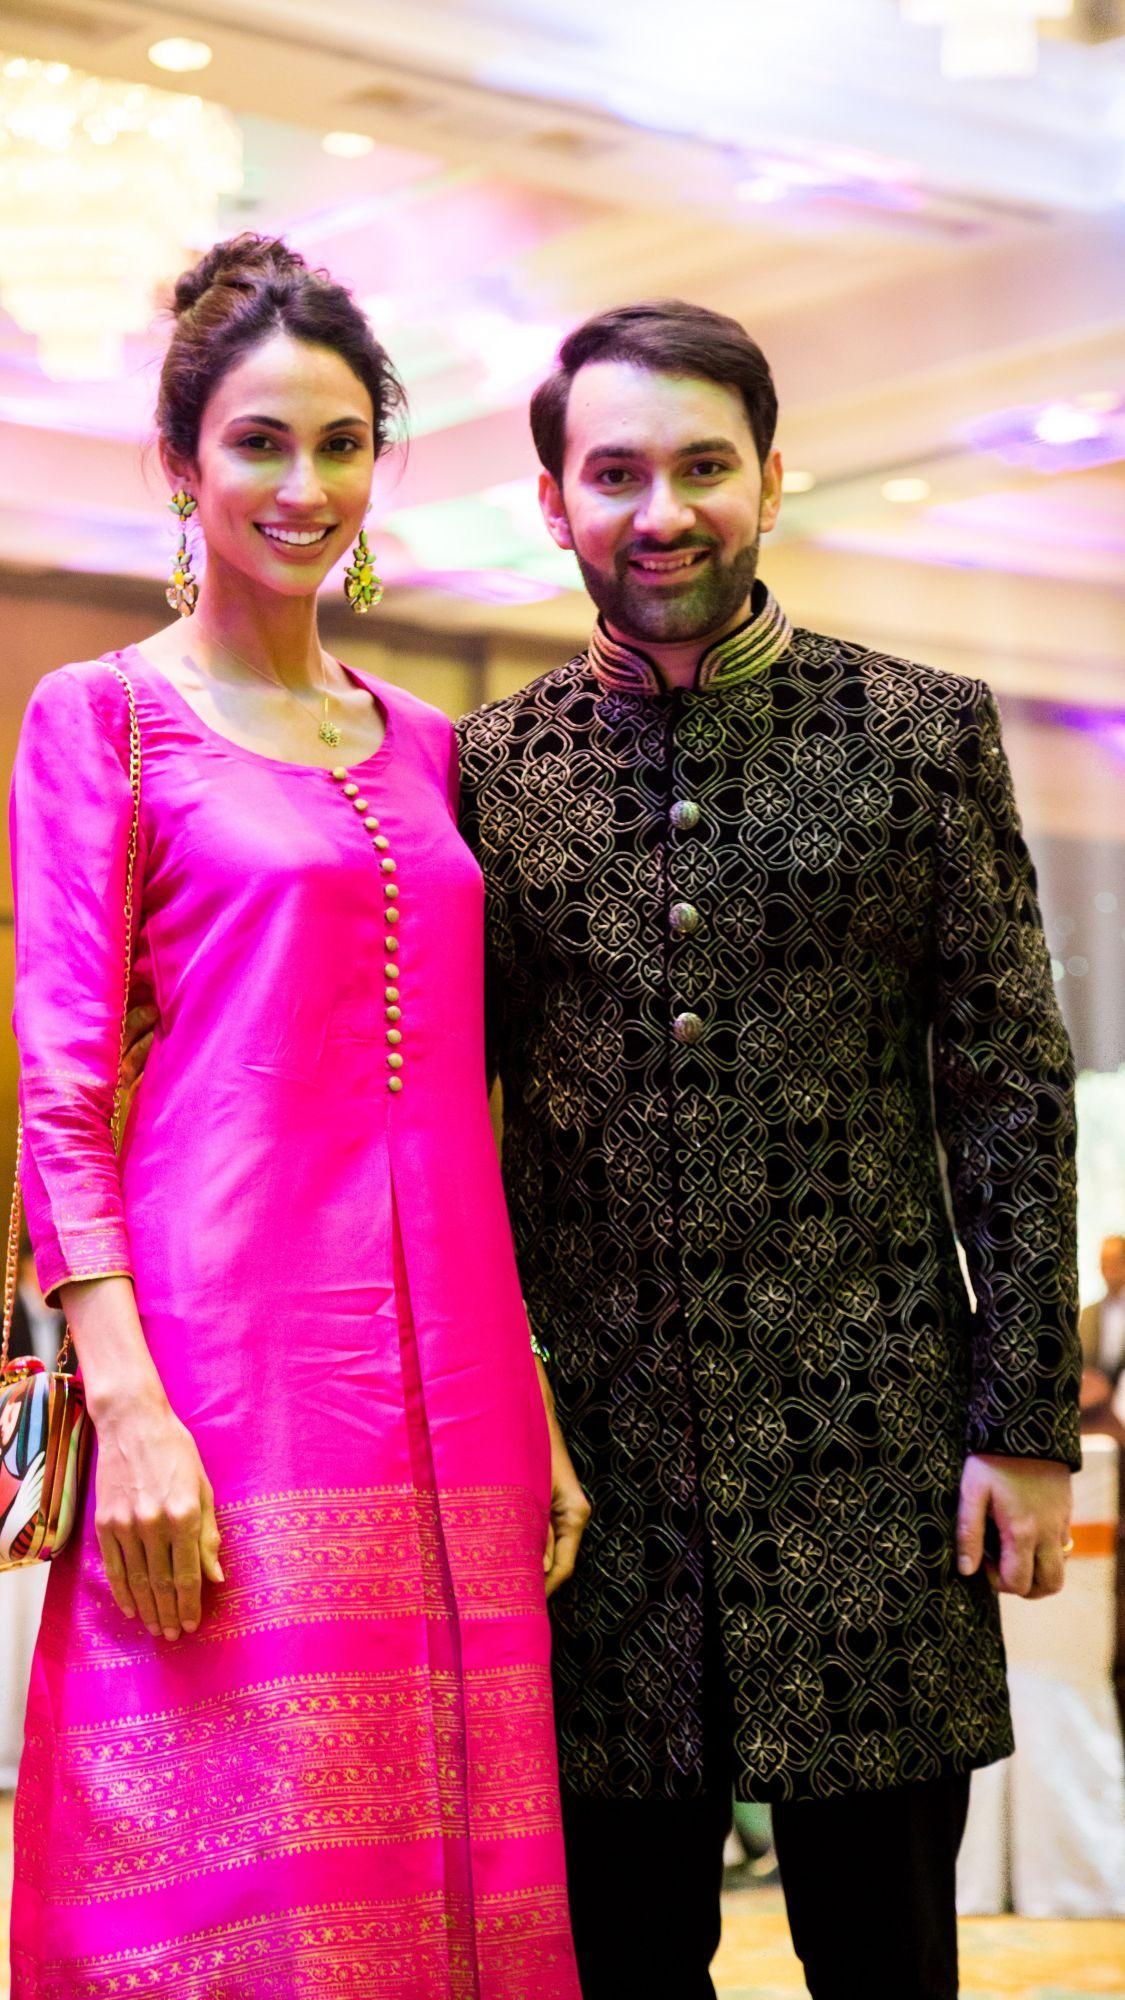 Deborah Henry and Dr Rajiv Bhanot